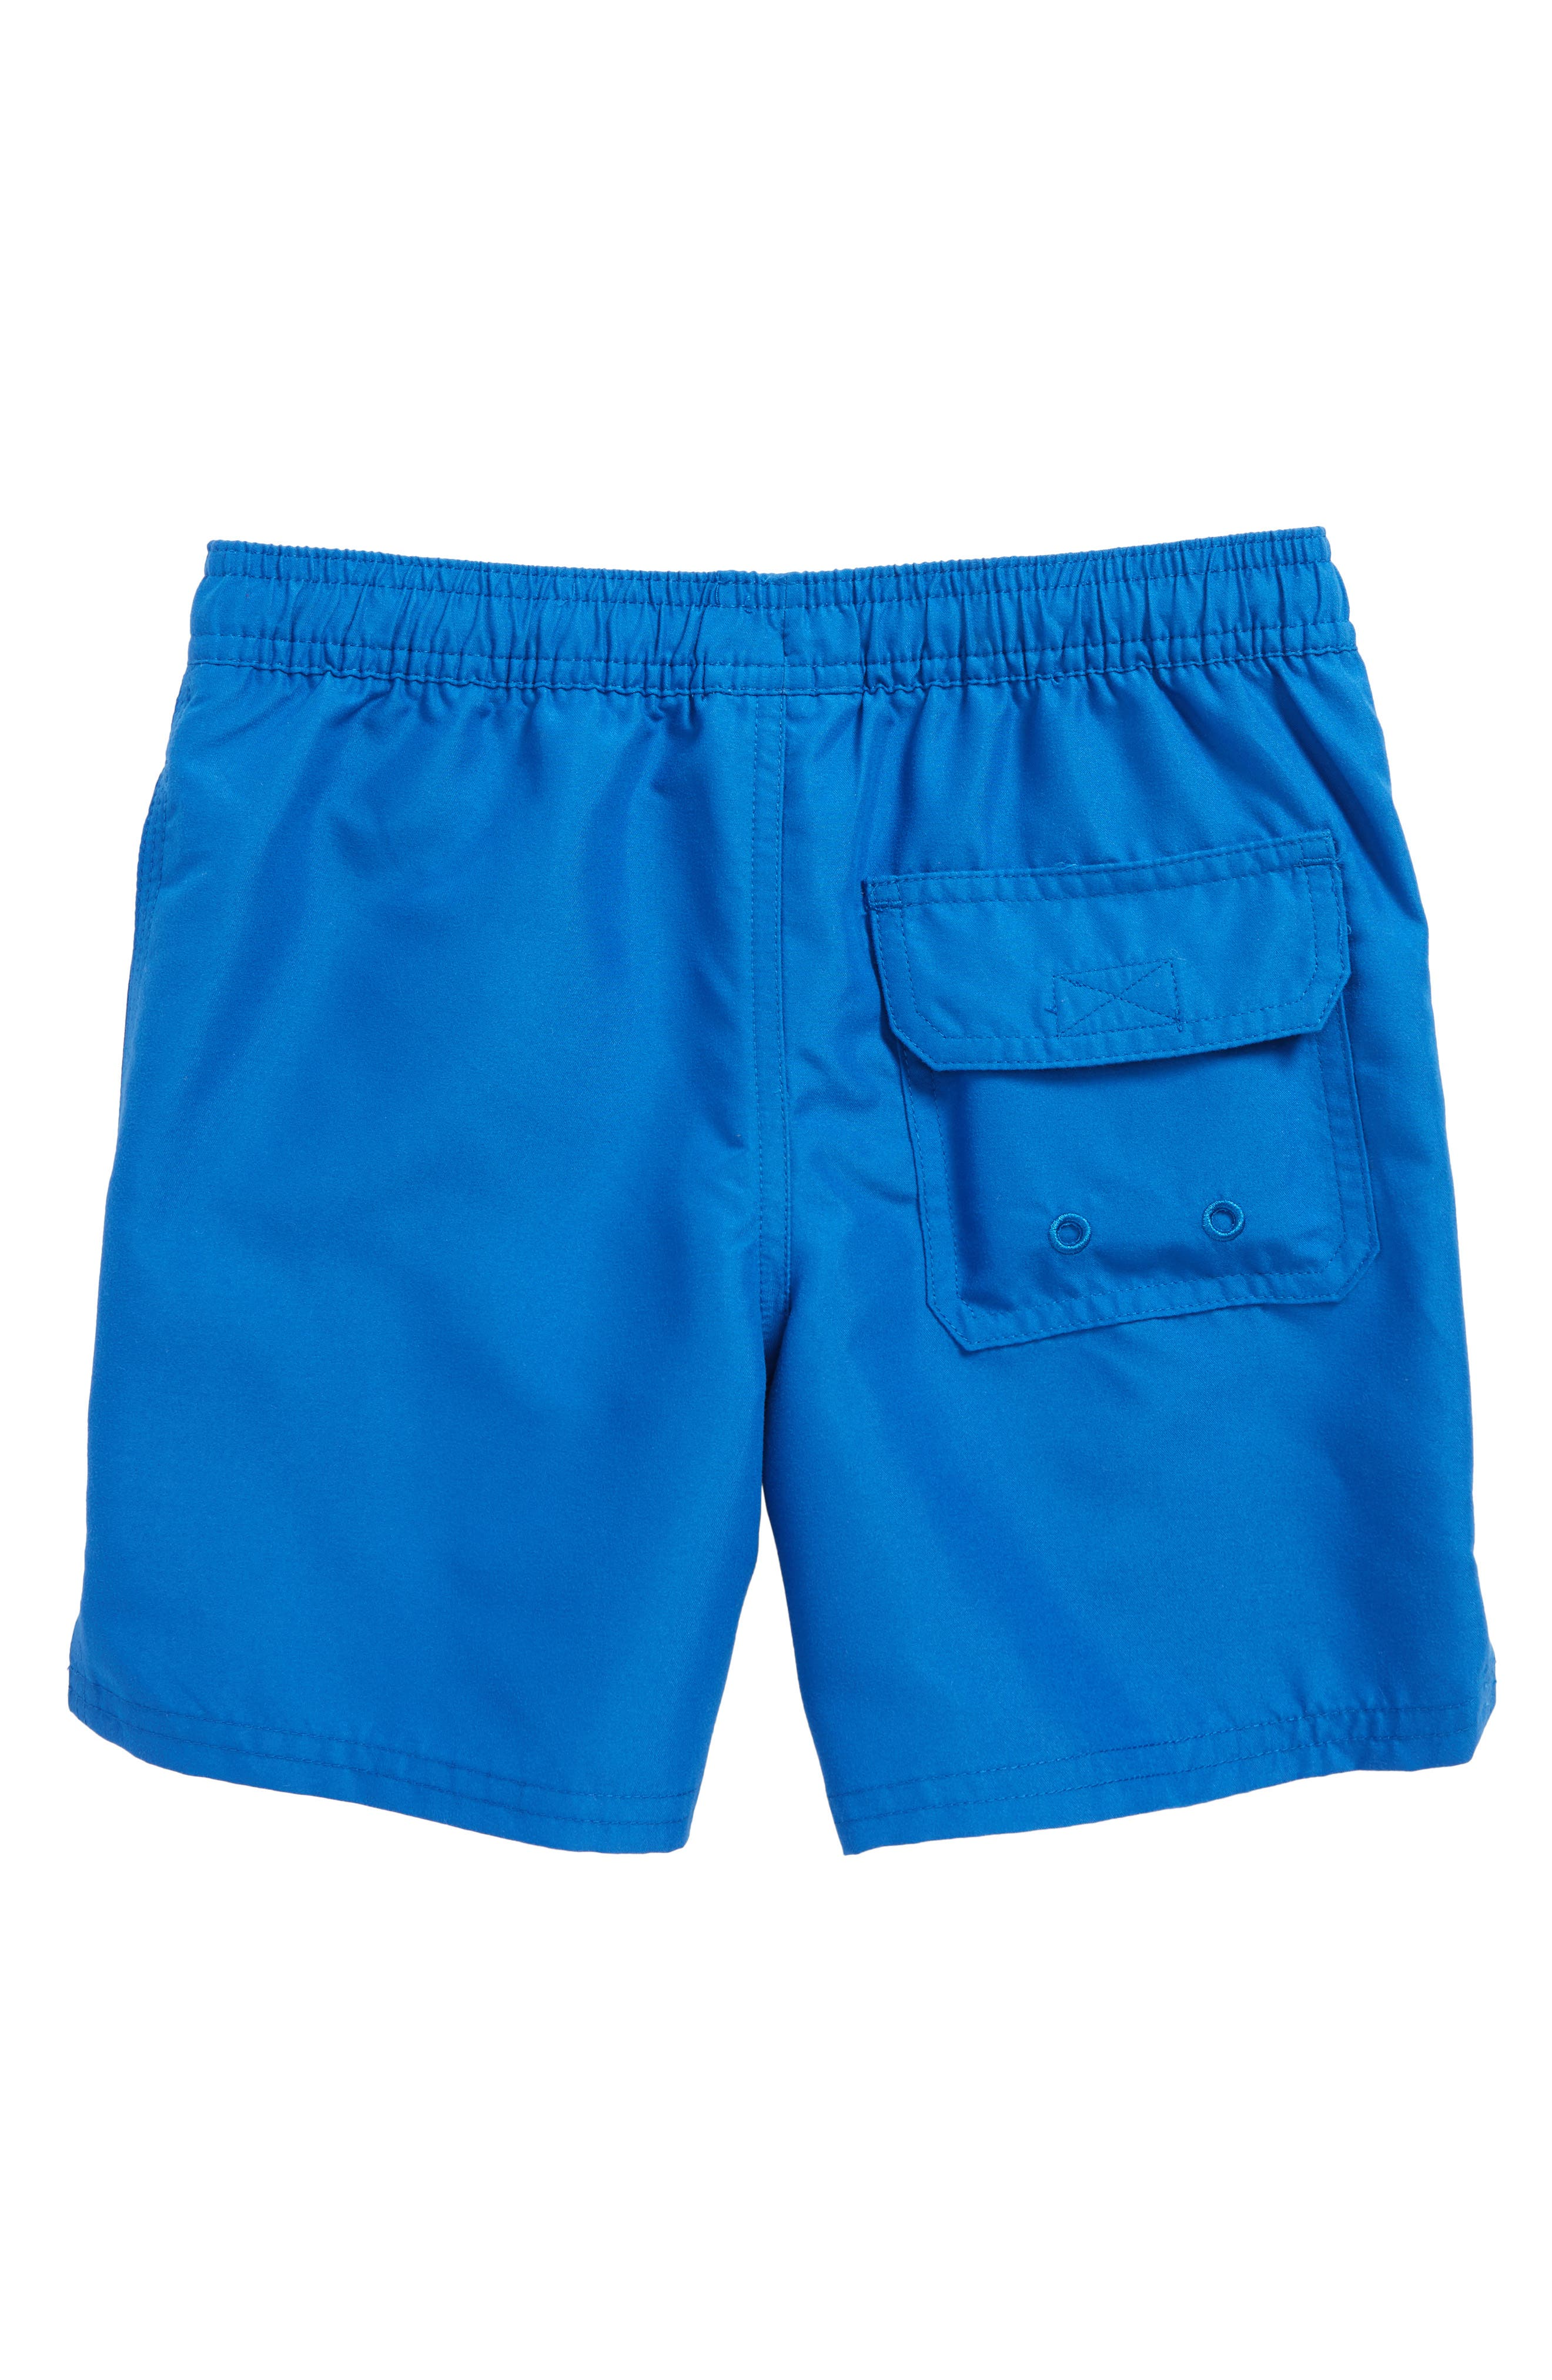 Bungalow Board Shorts,                             Alternate thumbnail 2, color,                             Yacht Blue